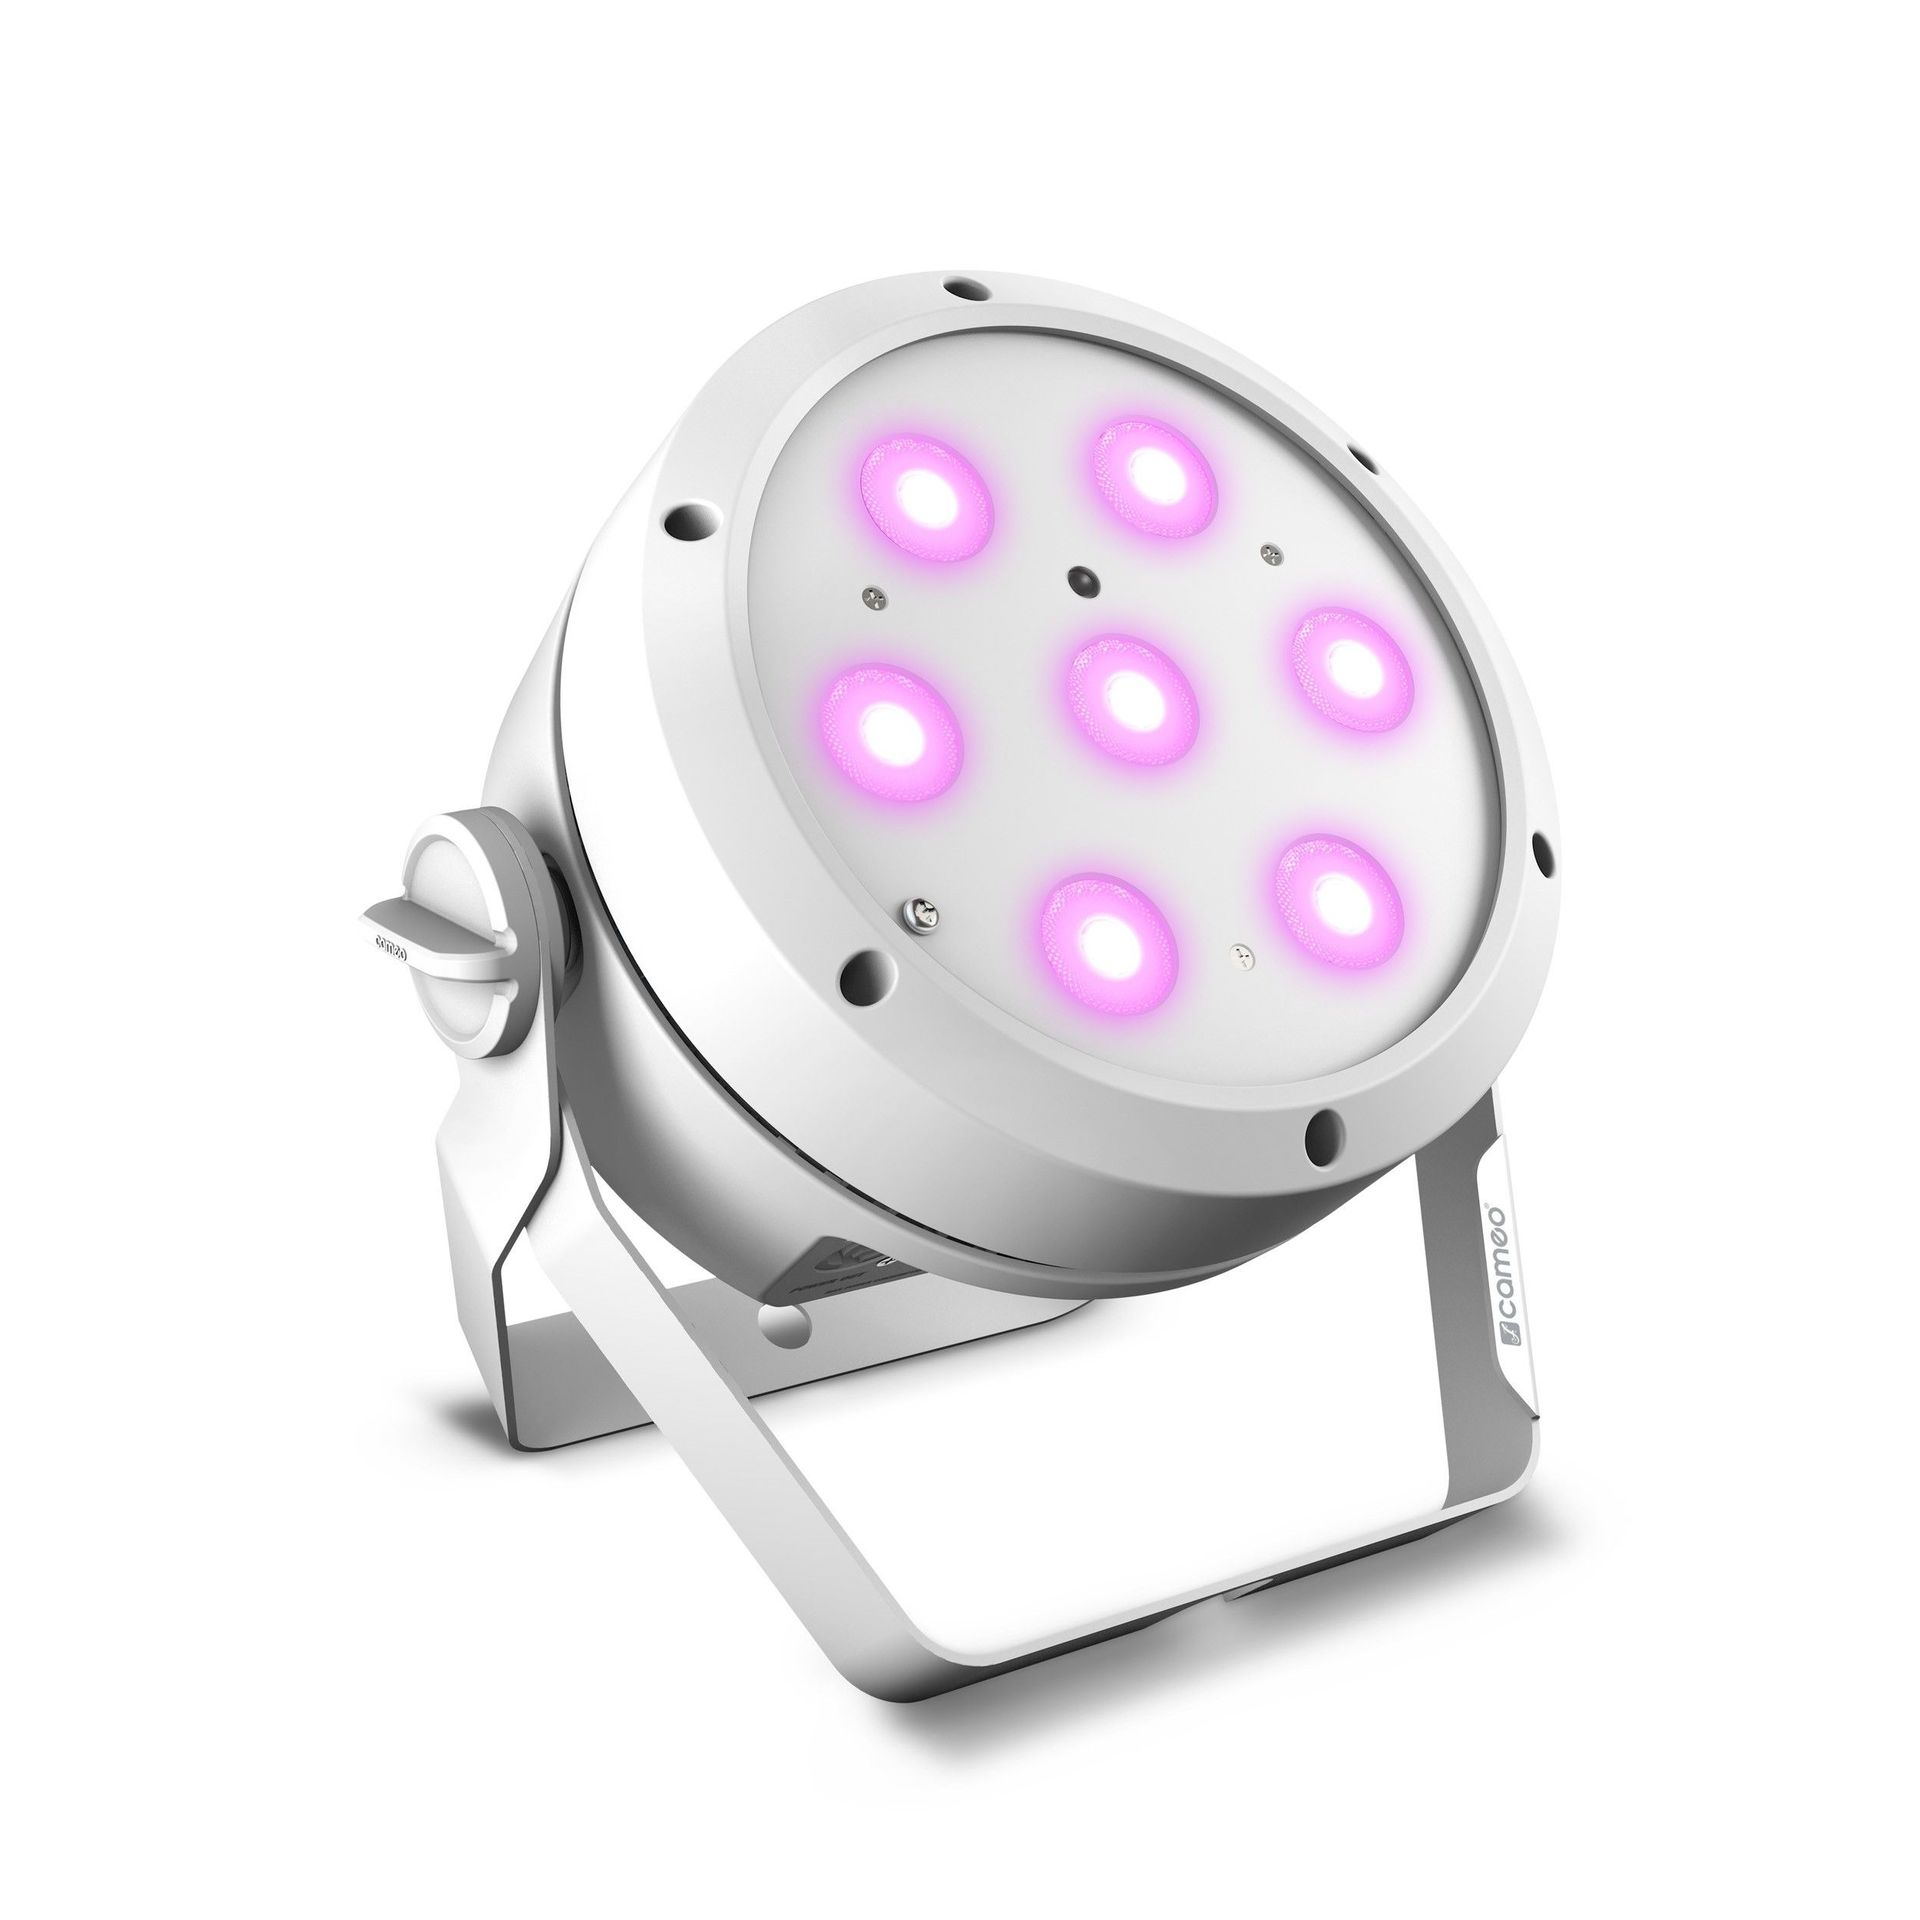 Cameo ROOT PAR 4 WH weiß   7 x 4 W RGBW LED PAR Scheinwerfer